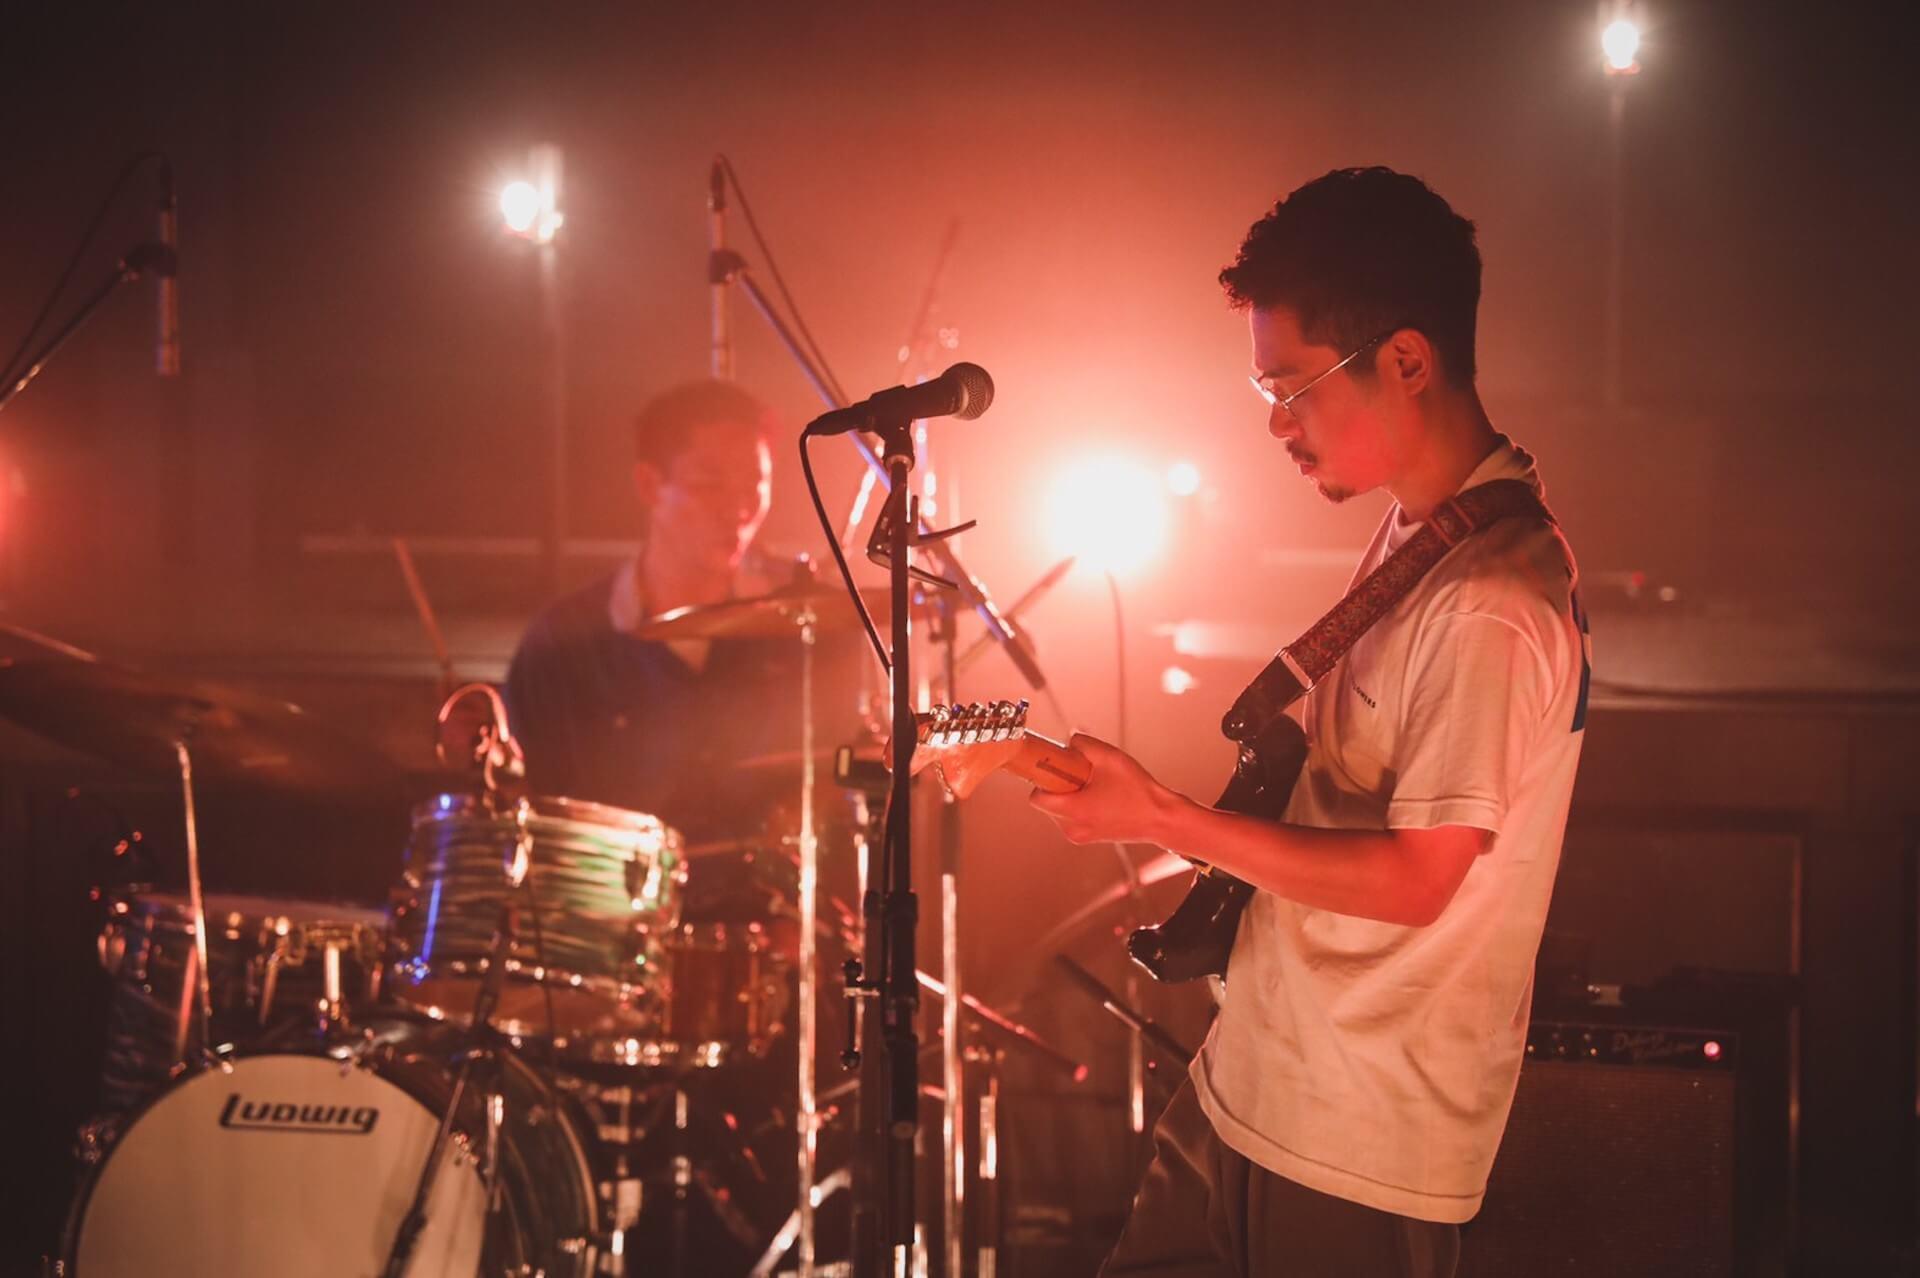 LIVEWIREで配信されたYogee New Wavesのライブ映像が期間限定で見逃し配信中!ライブレポートも到着 music200714_livewire_yogeenewwaves_05